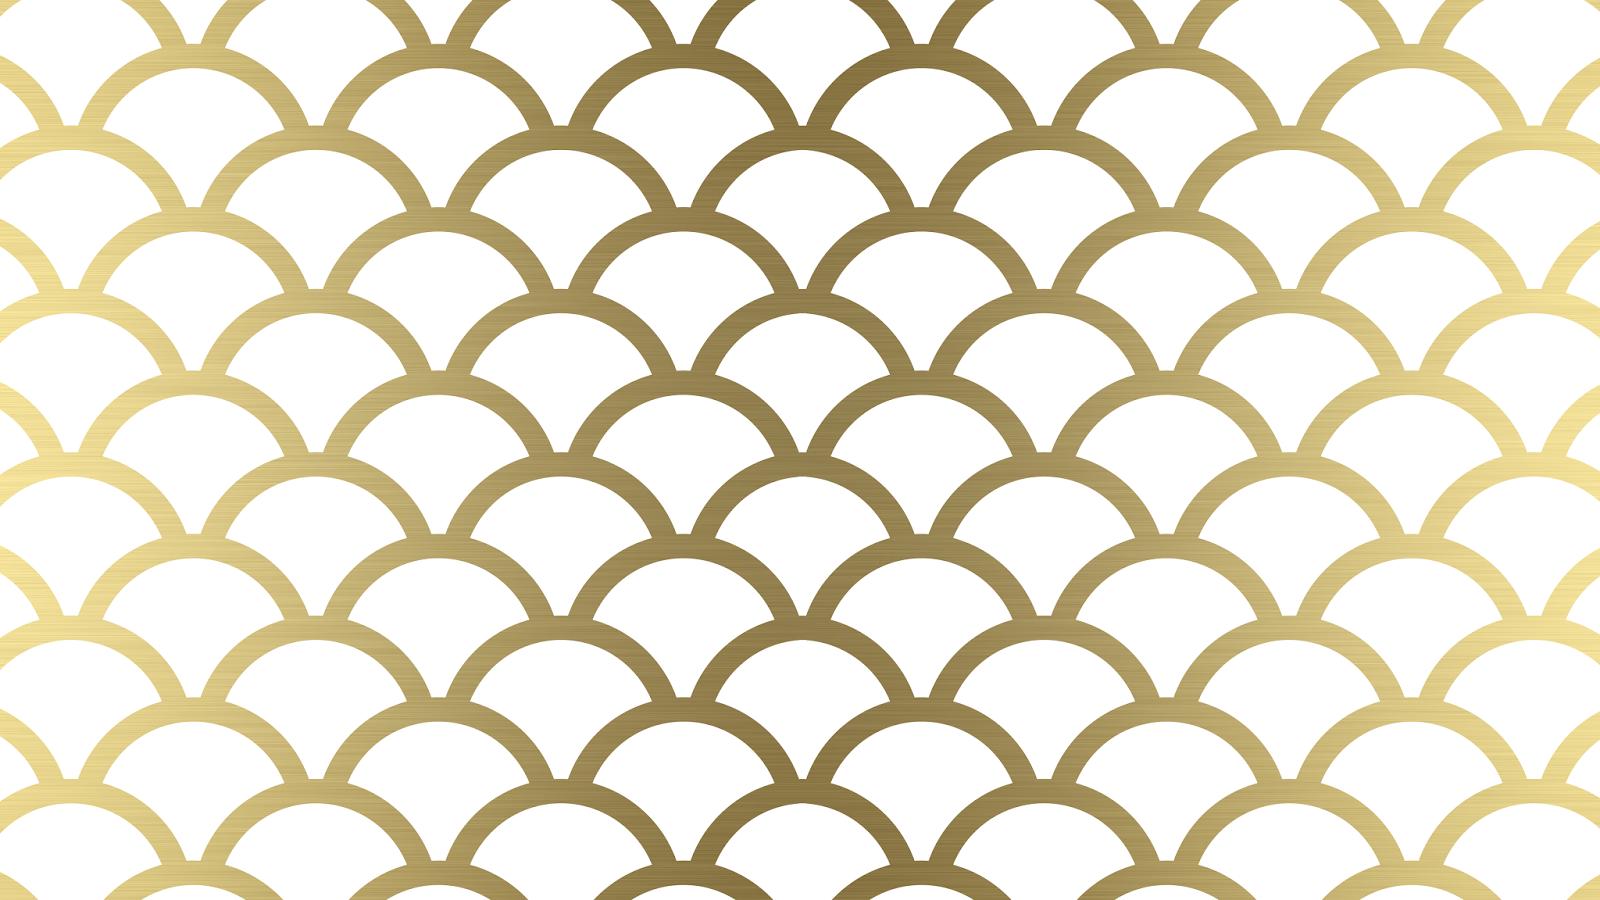 [48+] Gold and White Desktop Wallpaper on WallpaperSafari